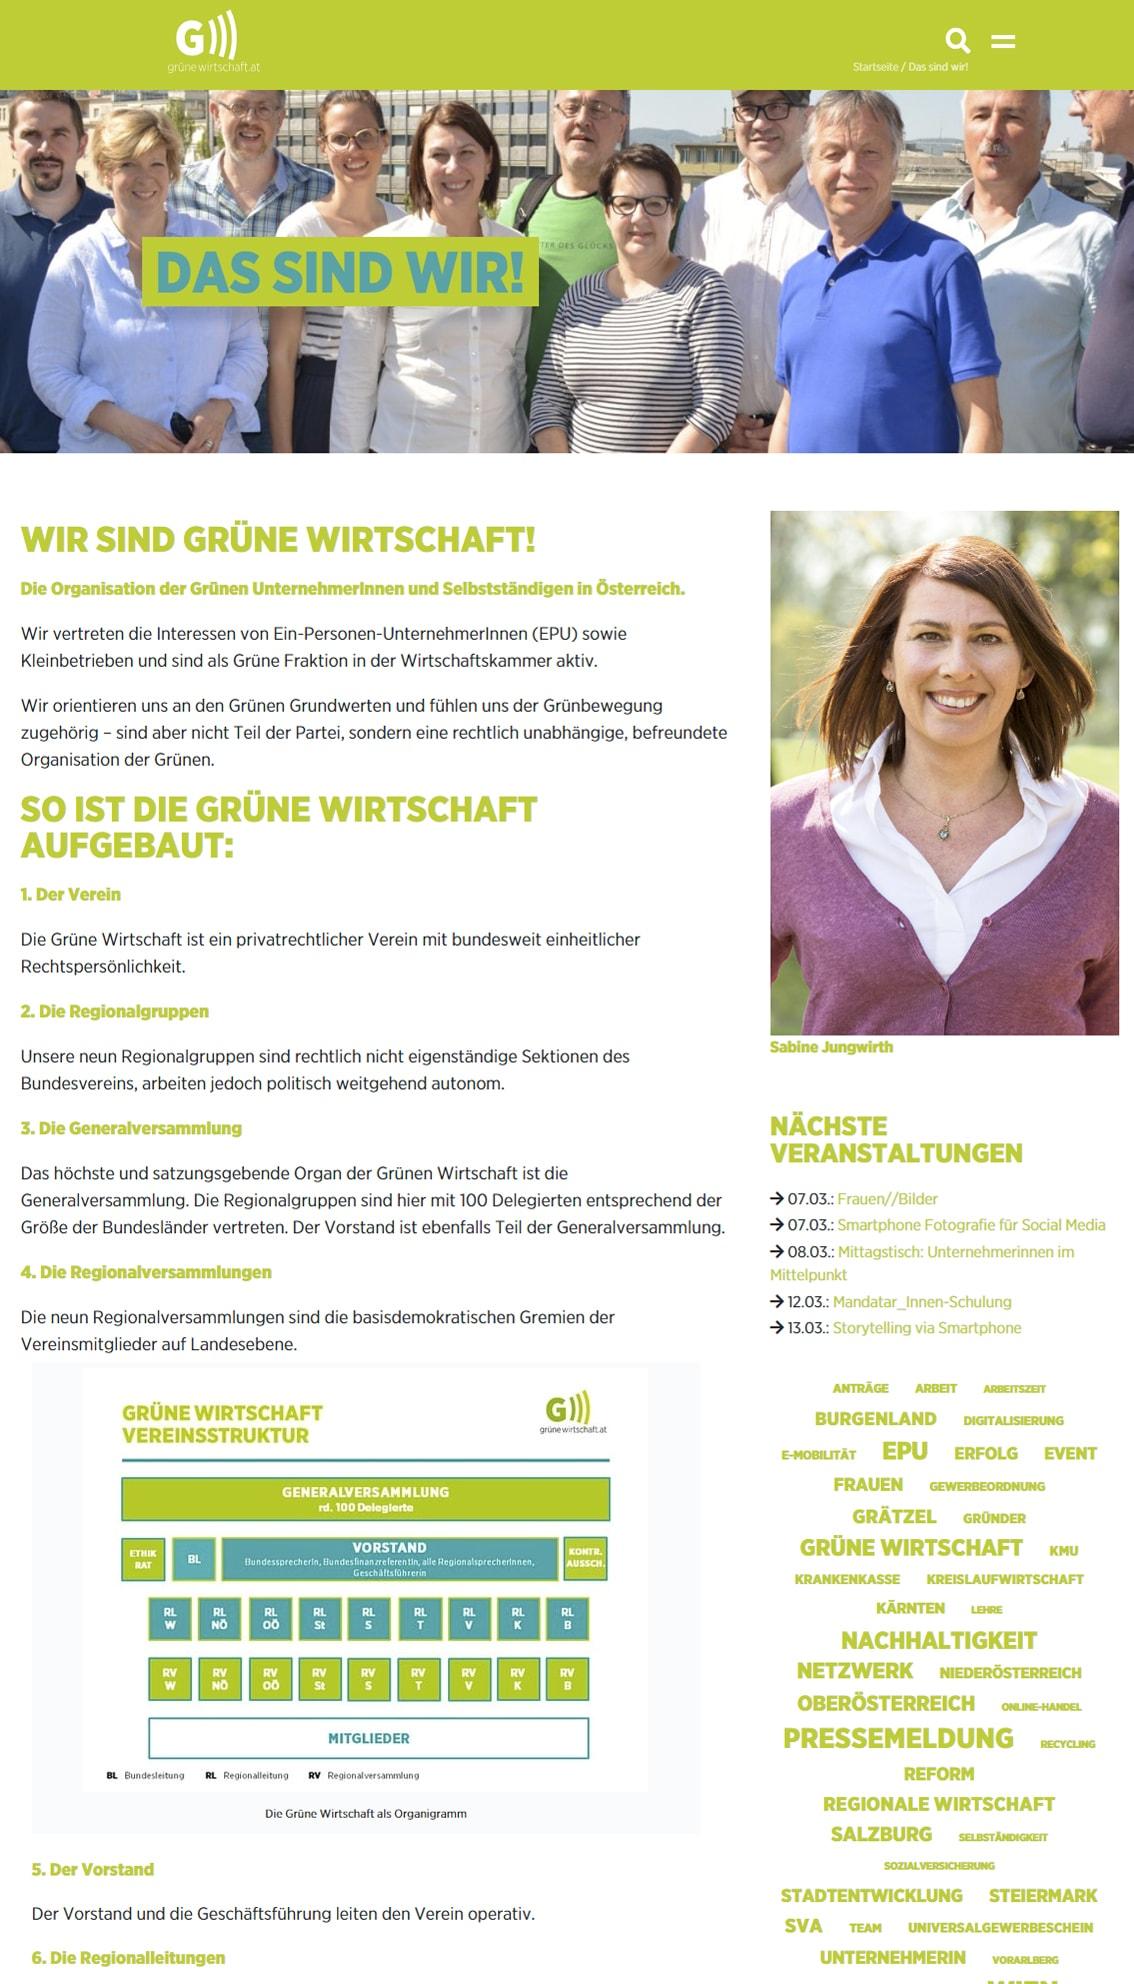 Grüne Wirtschaft Website | Lina Bibaric